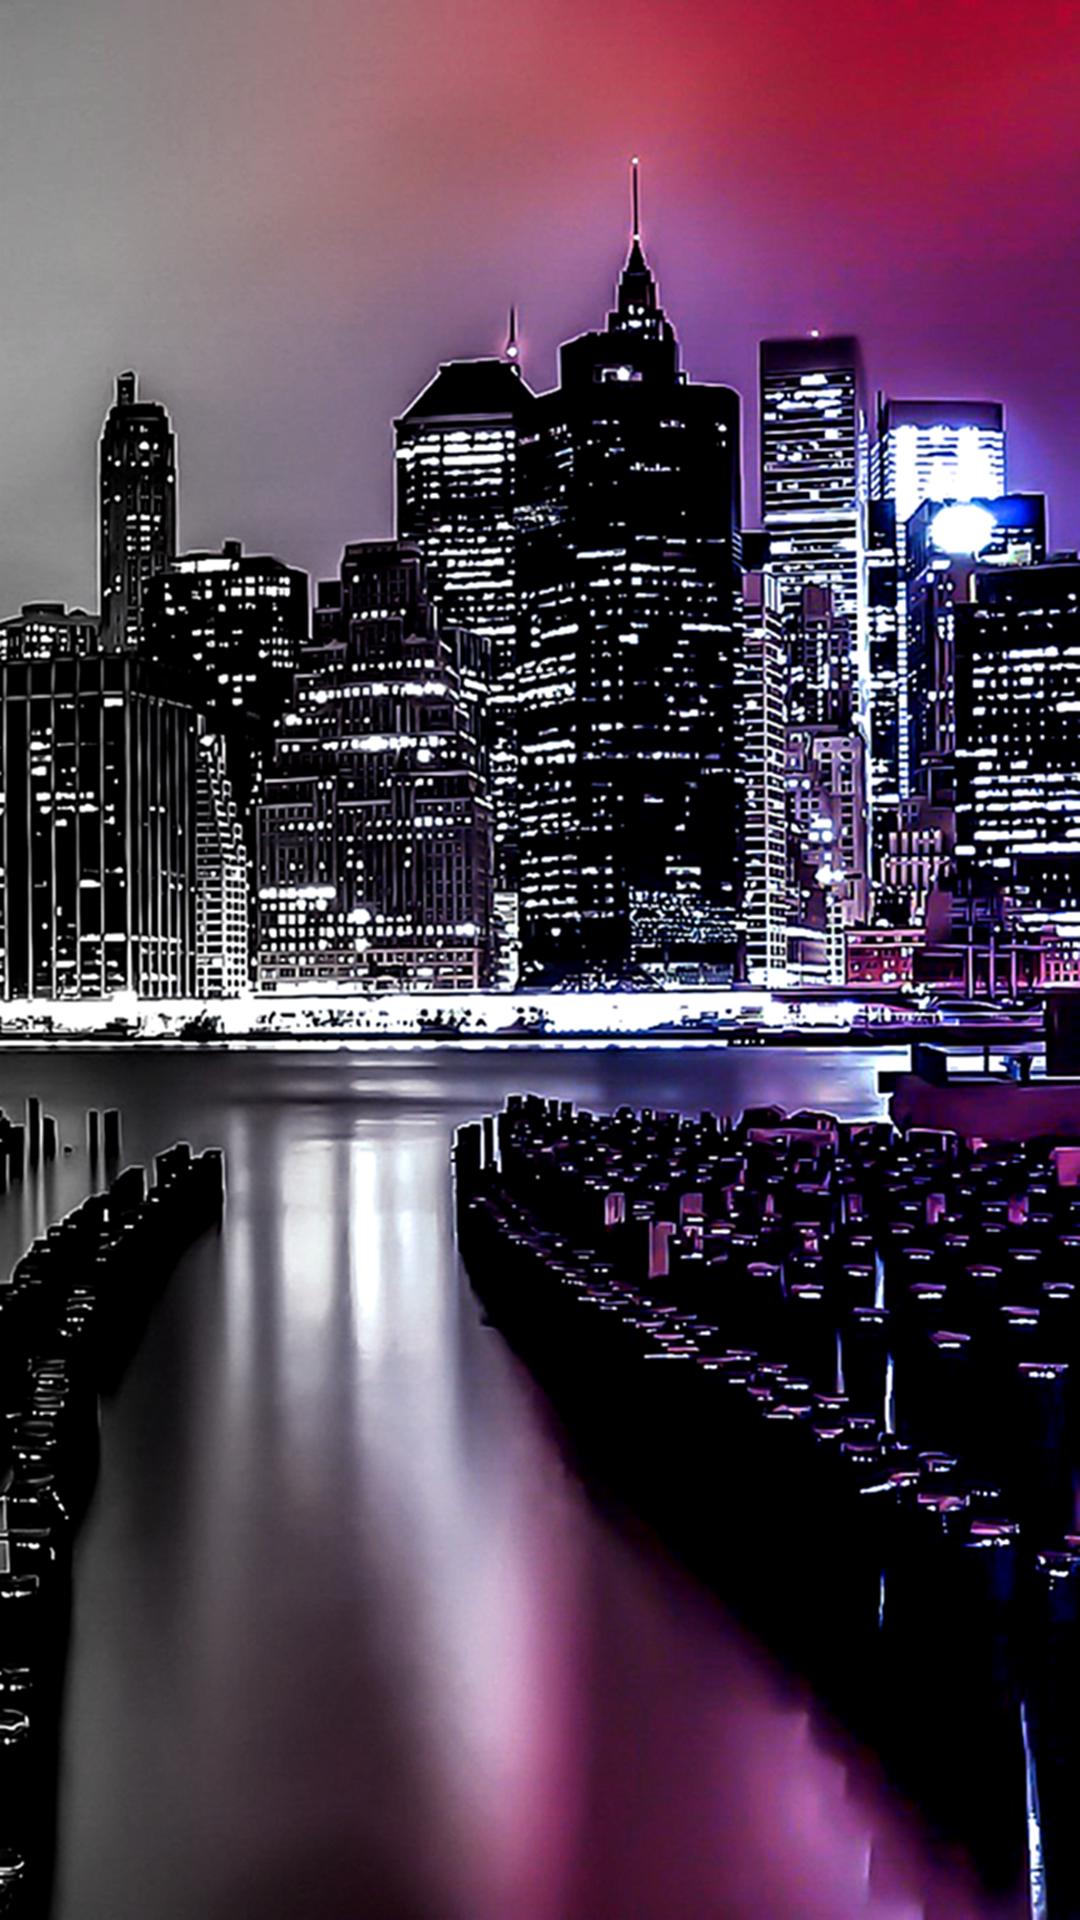 Night City Lights City Wallpaper City Lights At Night Night City